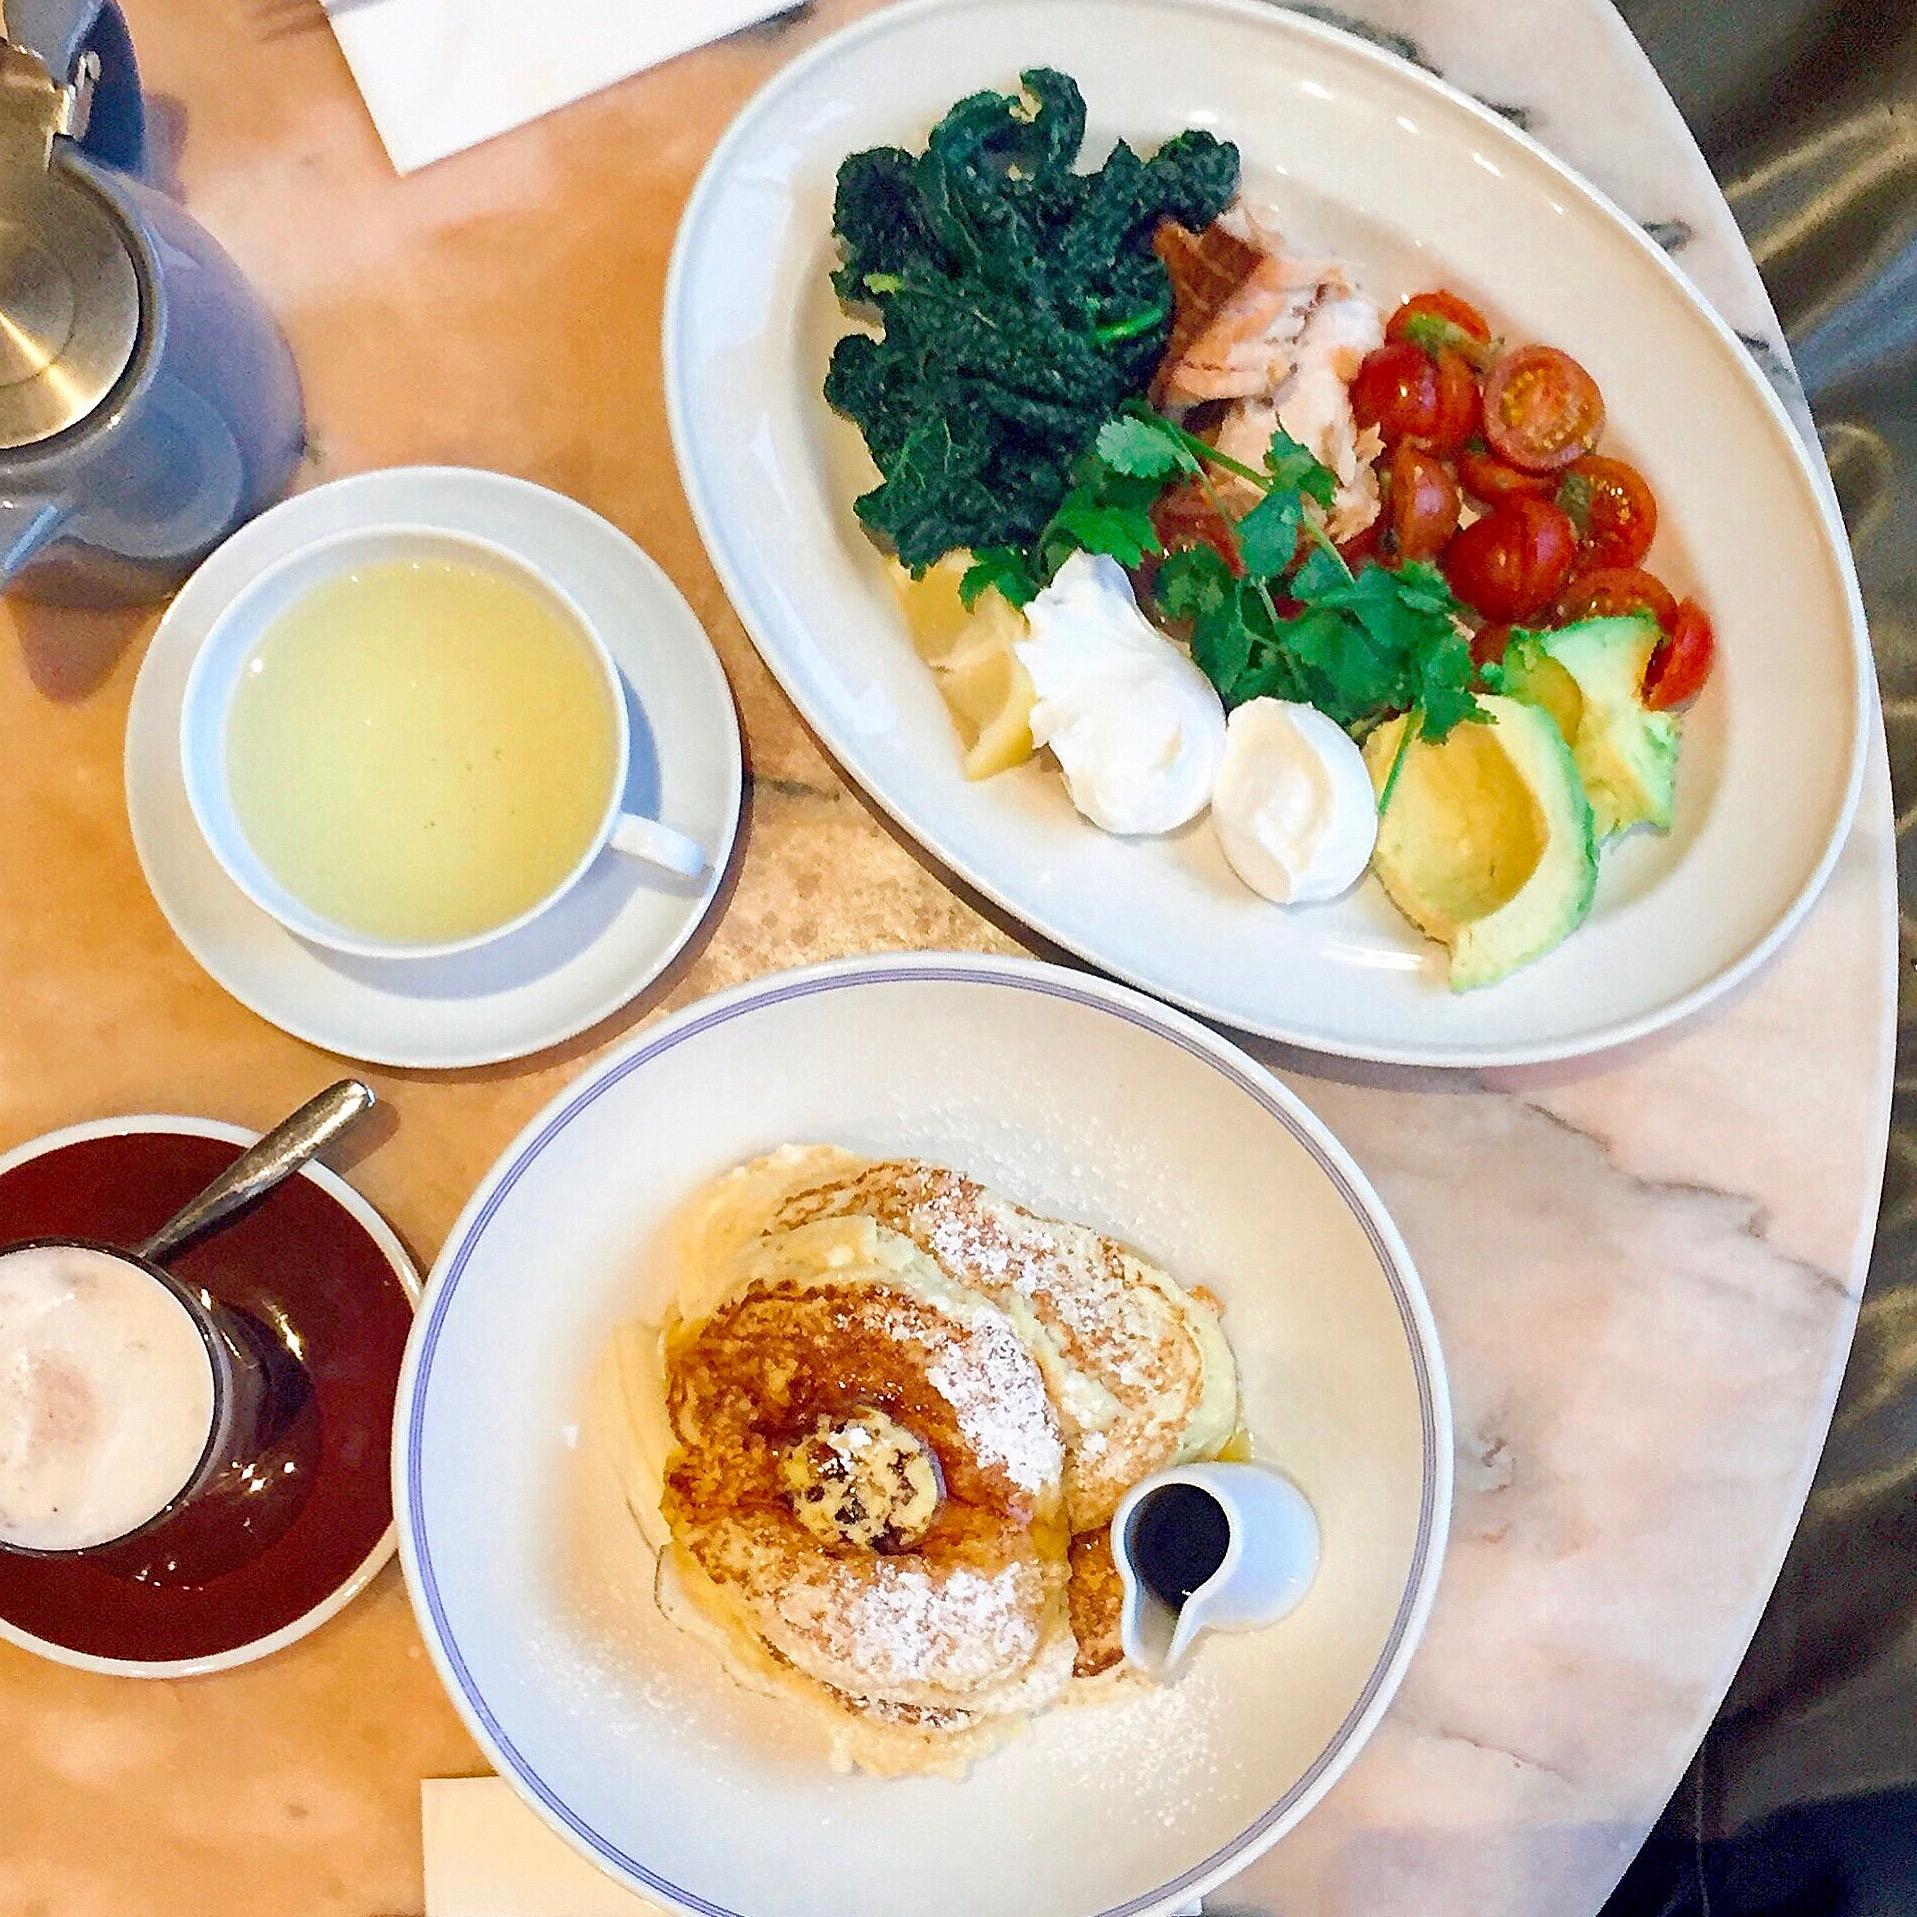 Granger & Co, travelers' breakfast spot in London